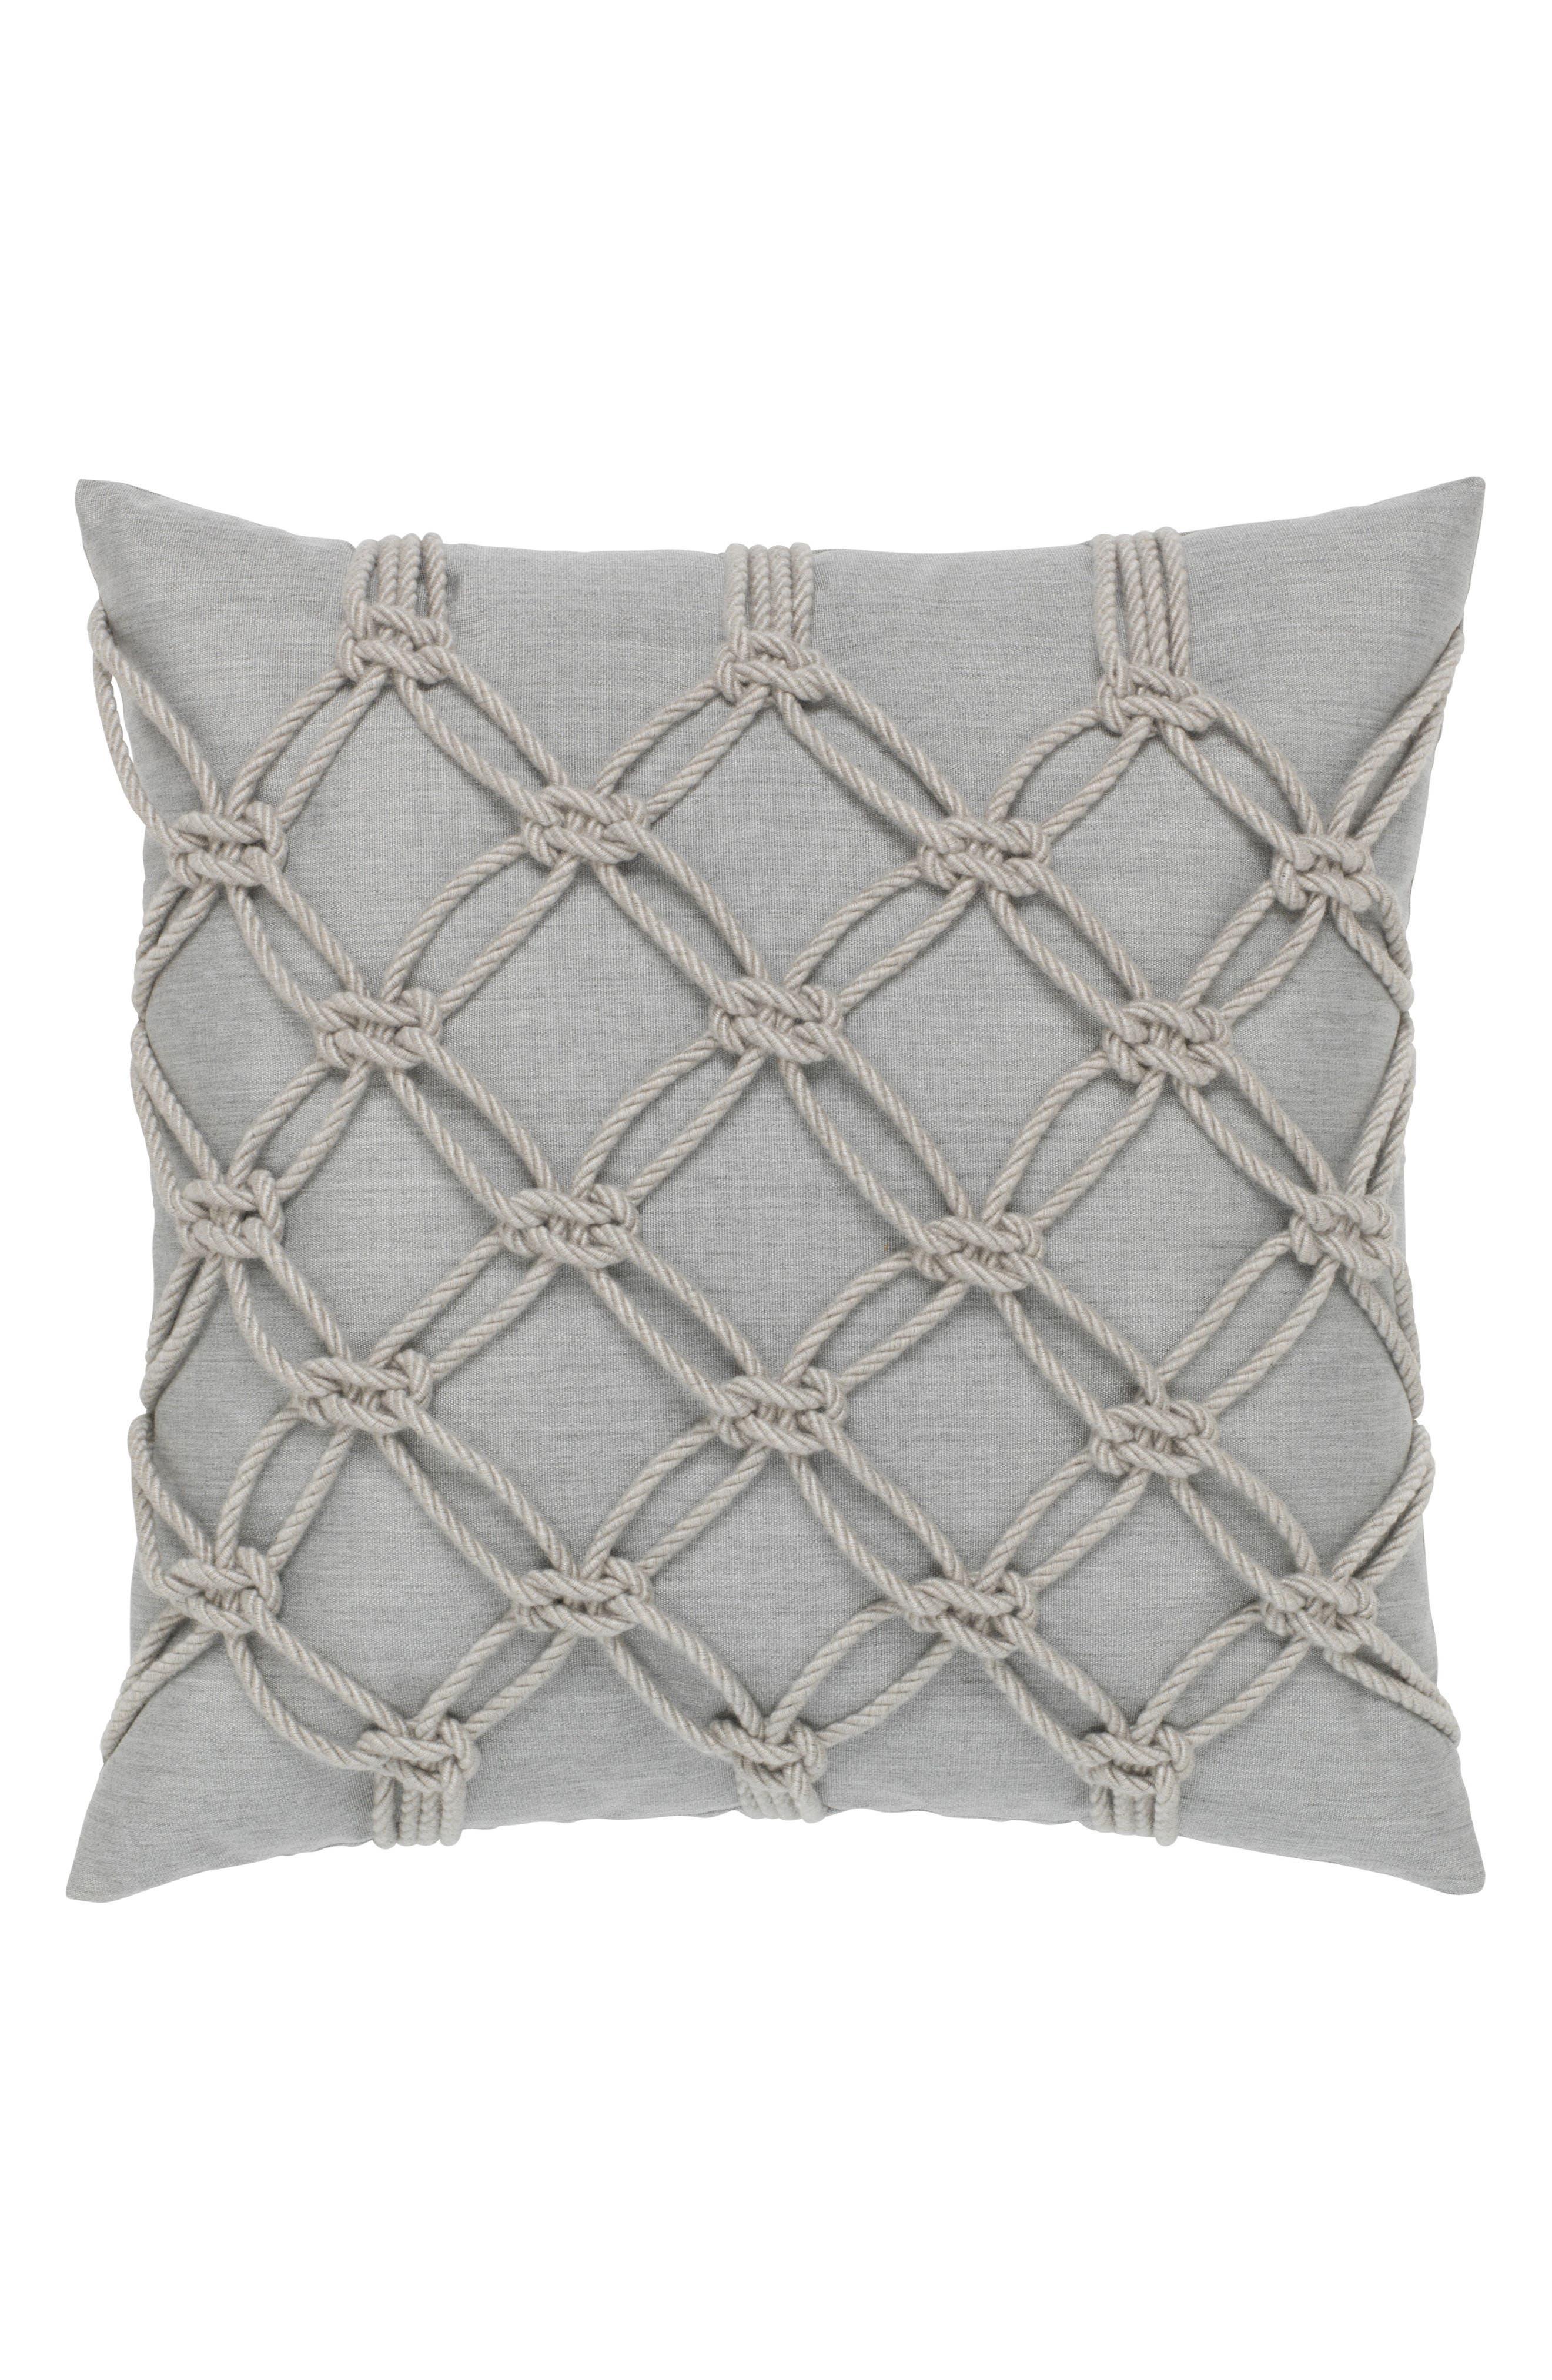 Granite Rope Indoor/Outdoor Accent Pillow,                         Main,                         color, 020